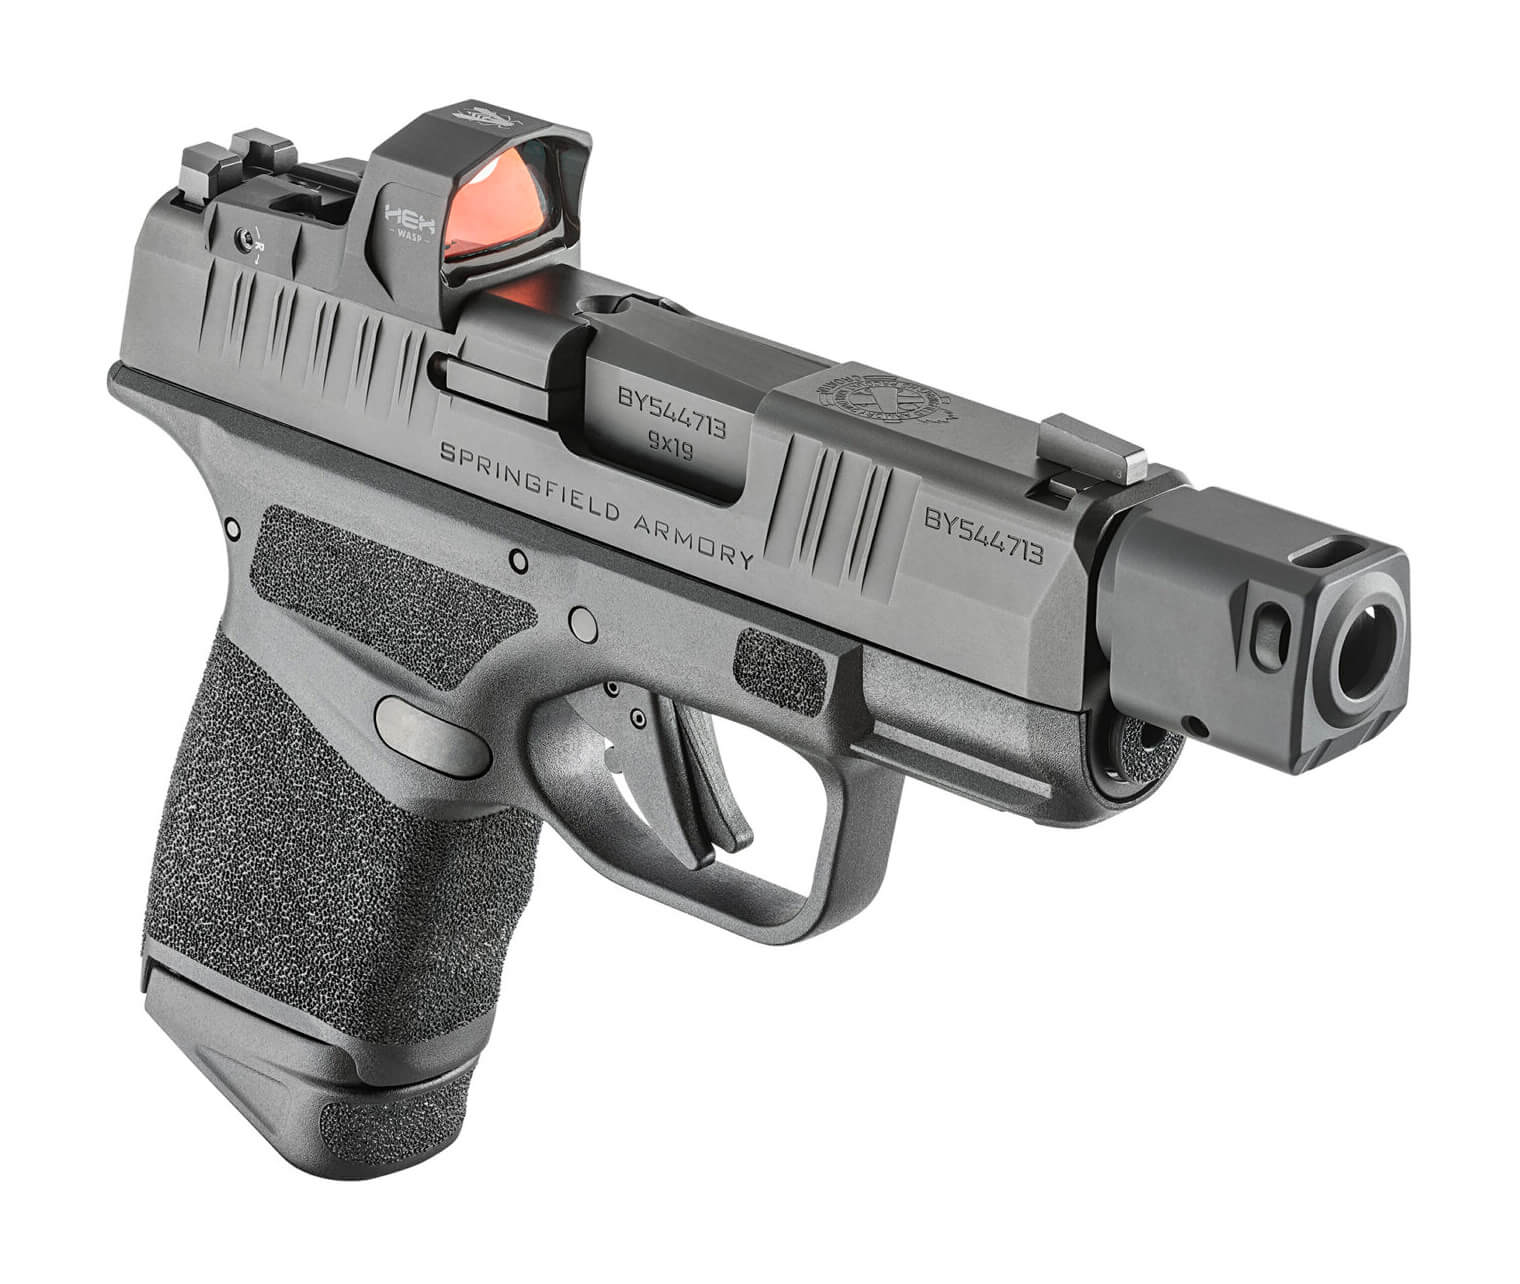 Hellcat RDP pistol with compensator